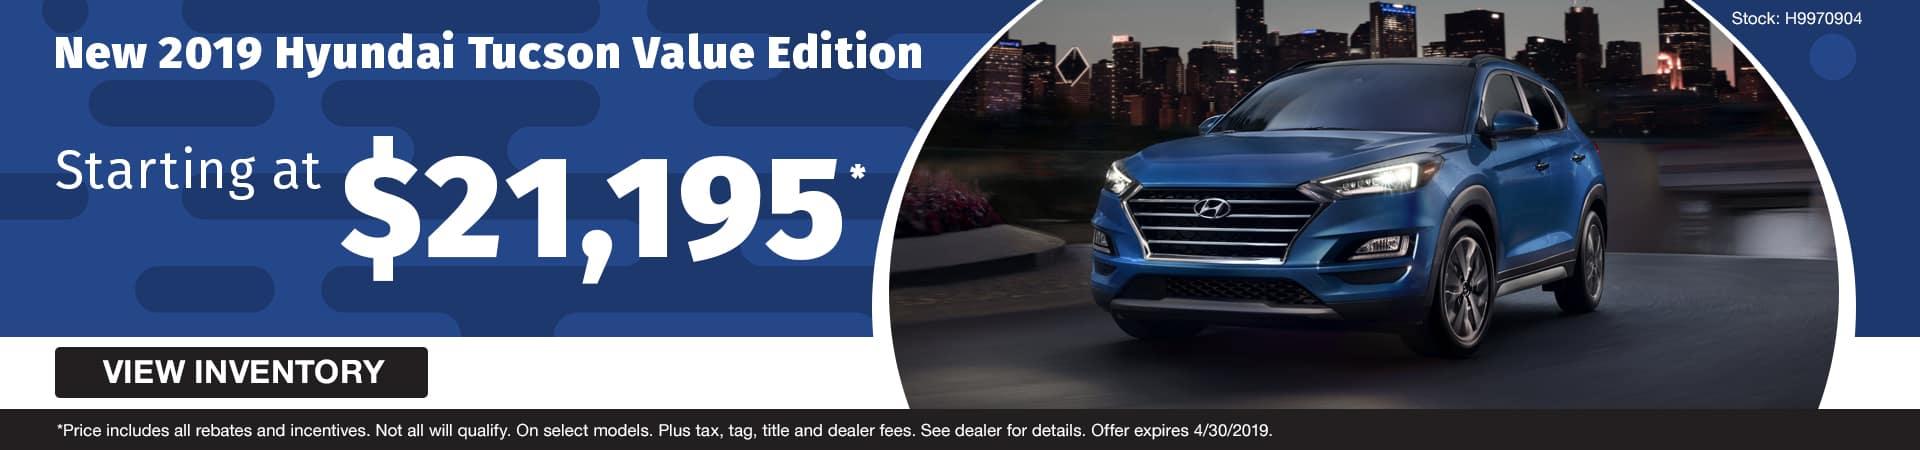 Drive a new 2019 Hyundai Tucson Value Edition starting at just $21,195 in Murfreesboro TN